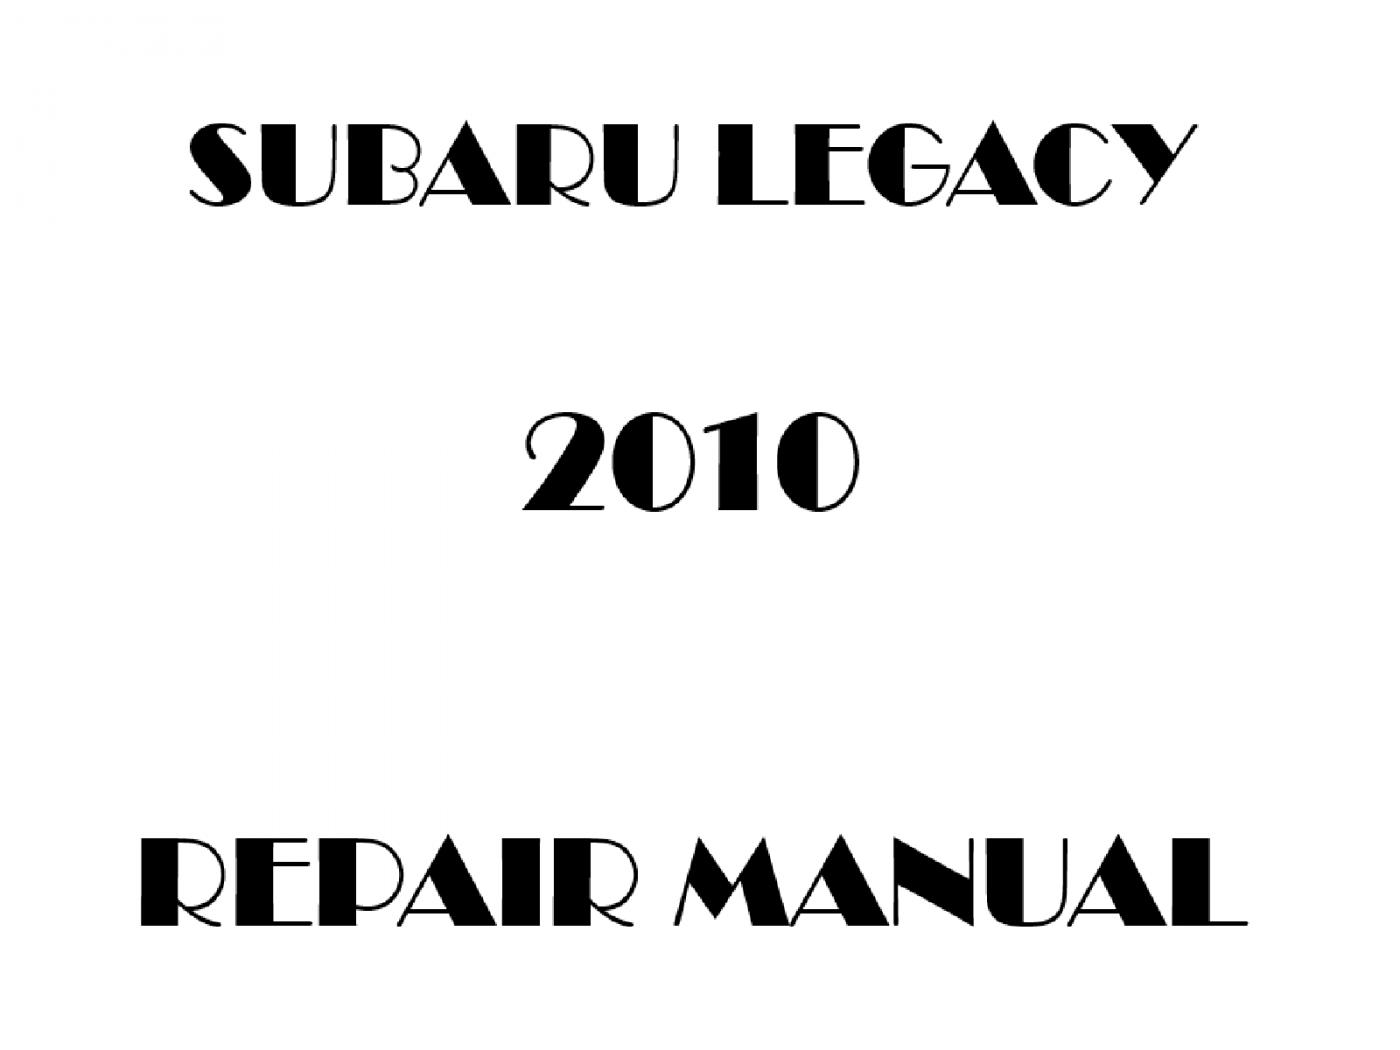 2010 Subaru Legacy repair manual